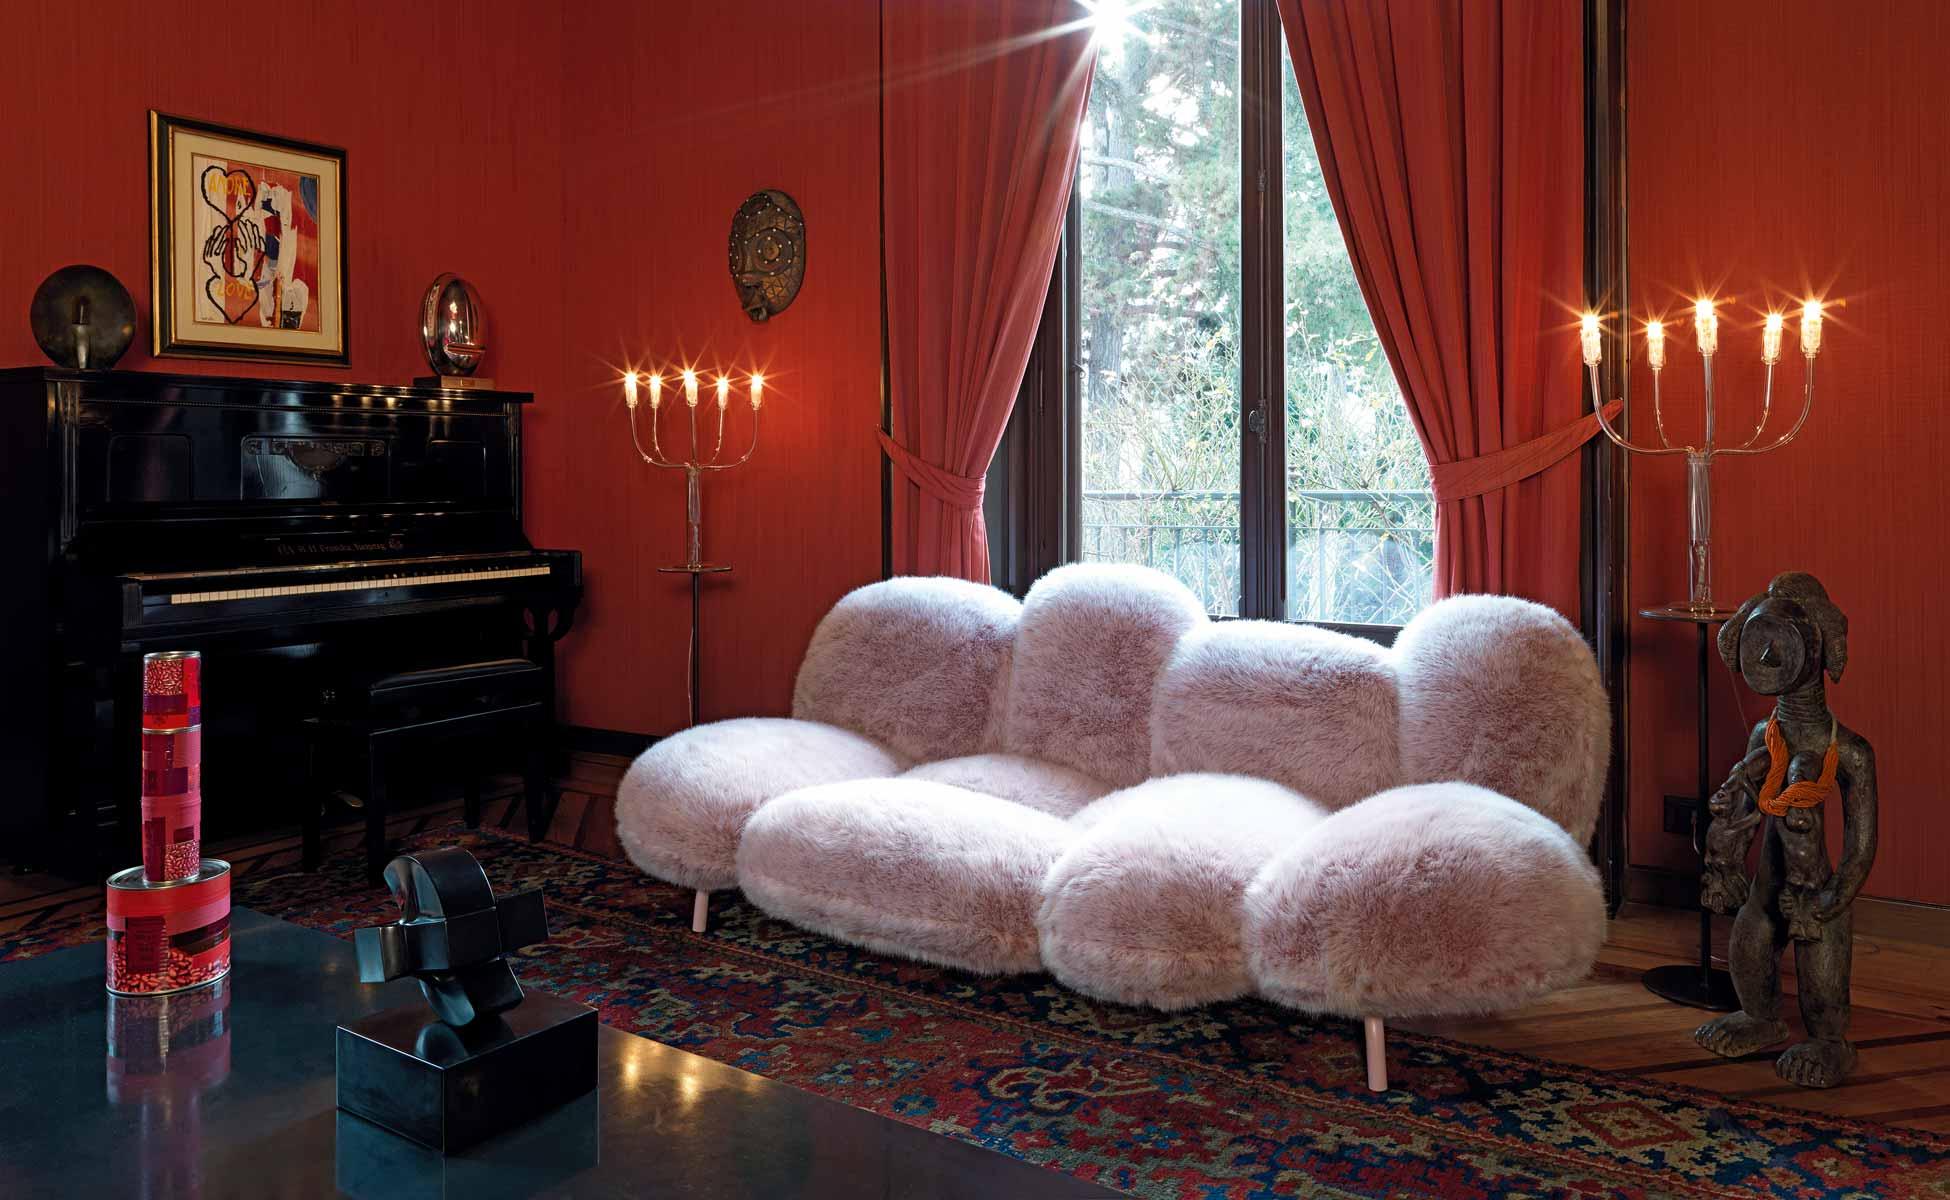 edra cipria sofa in berlin bei steidten+